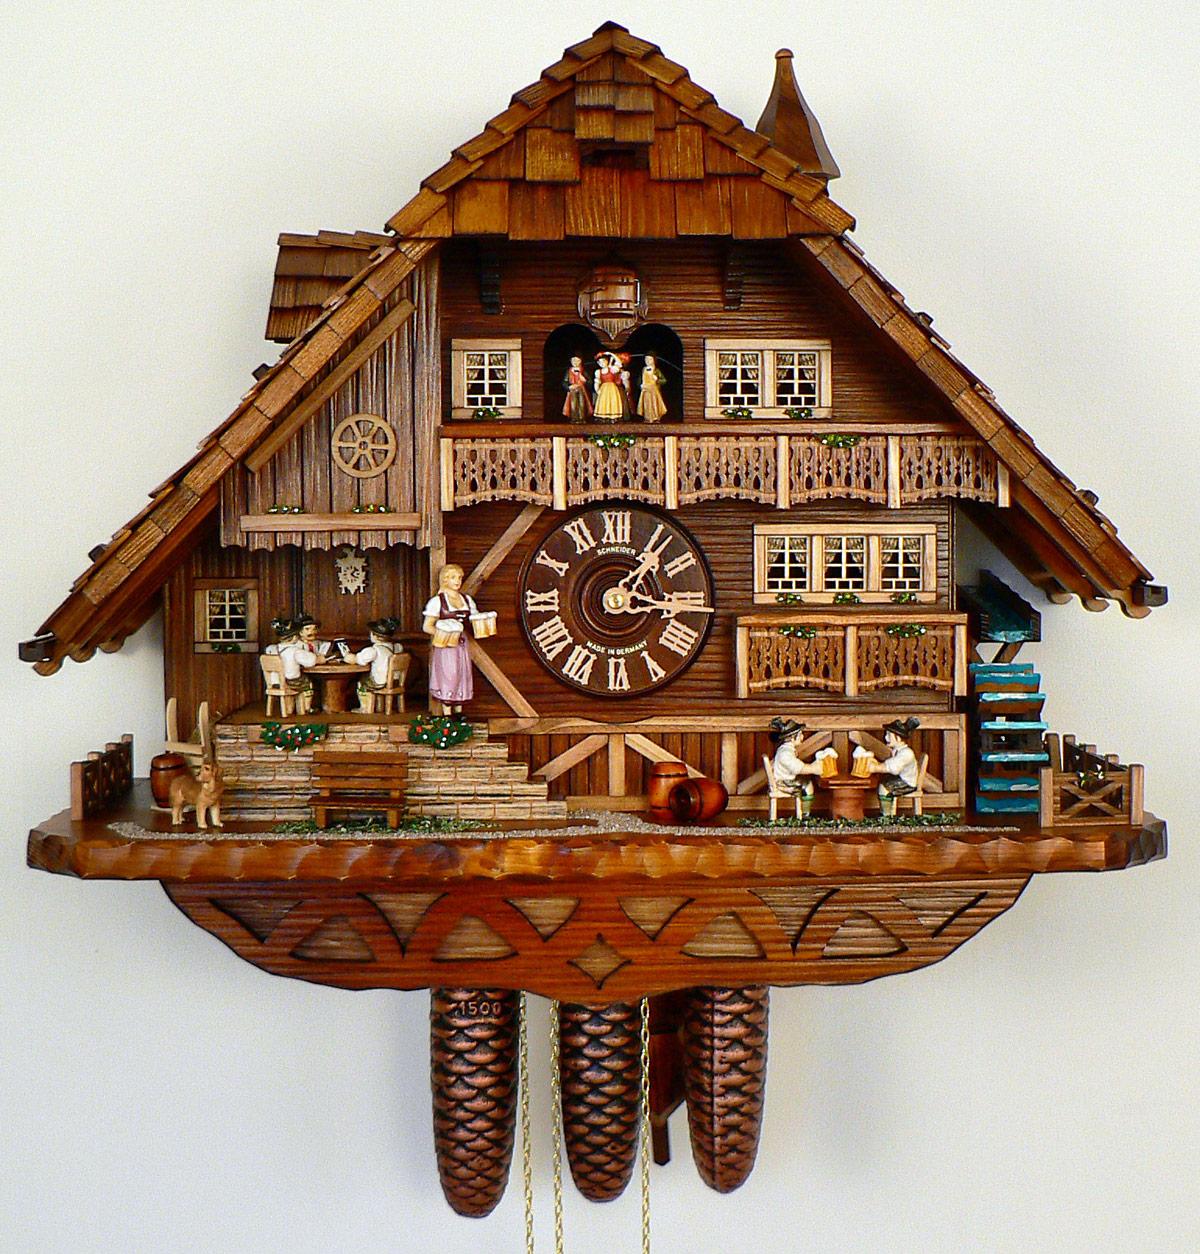 Cuckoo Clock Of The Year 2014 House Of Clocks German